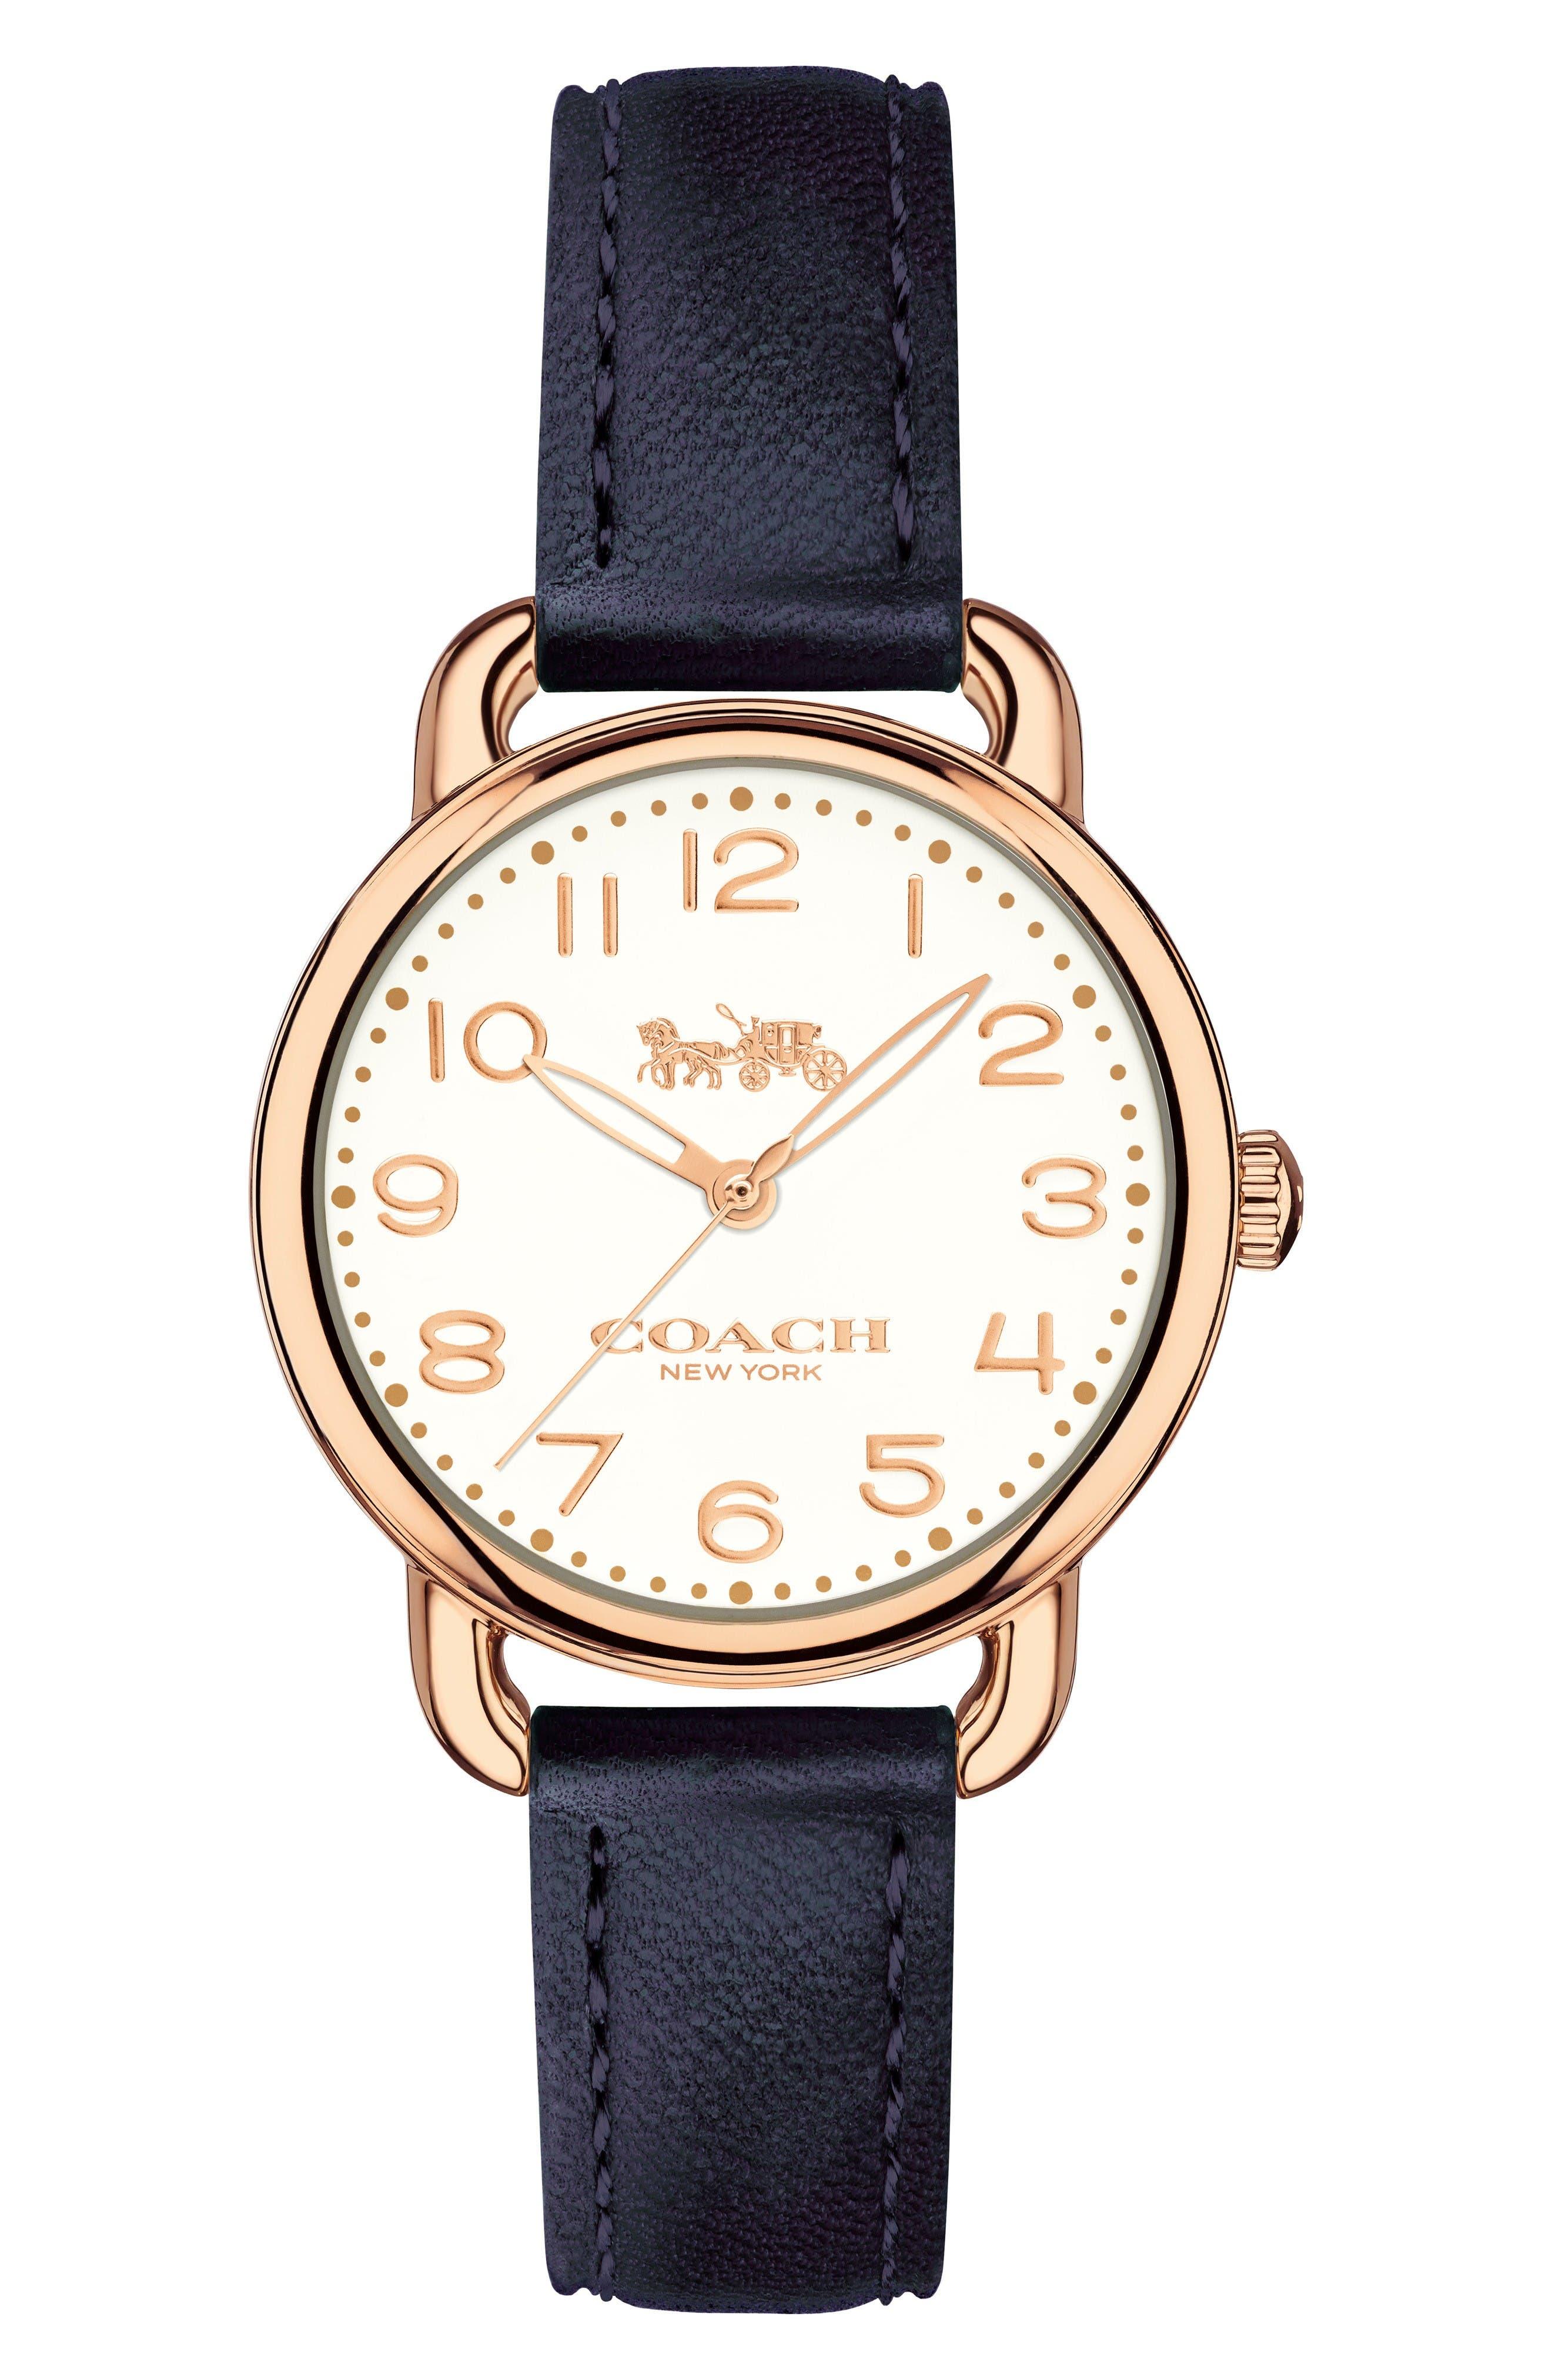 COACH Delancey Leather Strap Watch, 28mm